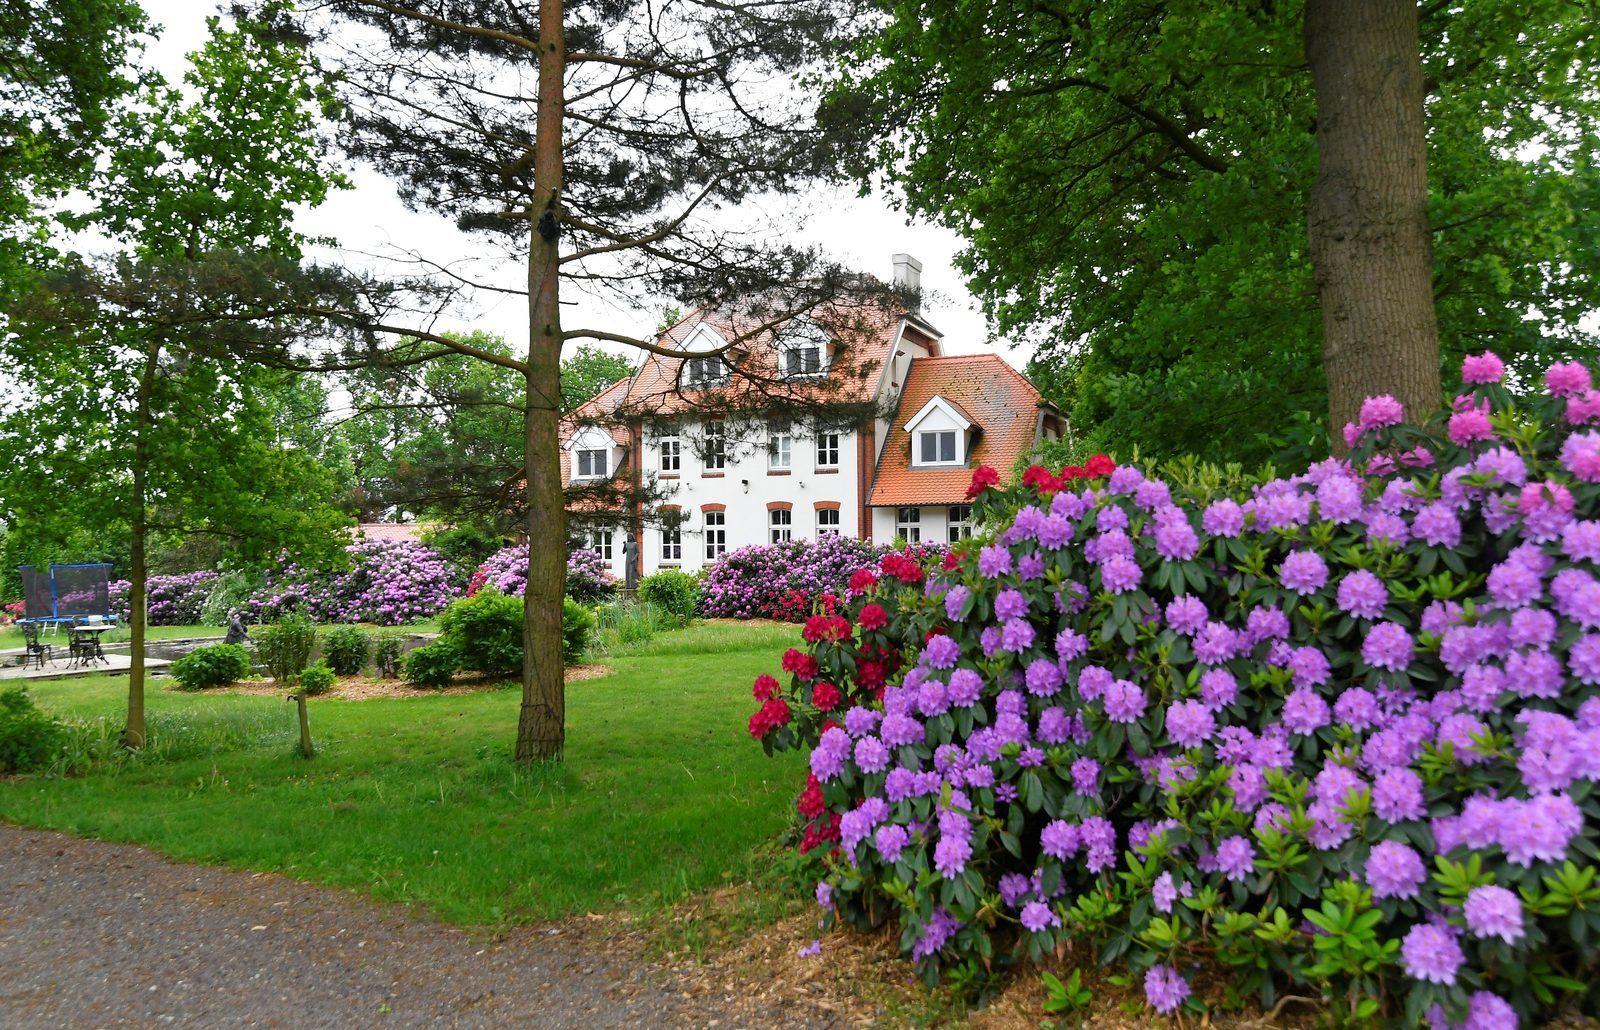 Landhuis Wielen wellness vakantiehuis in Duitsland